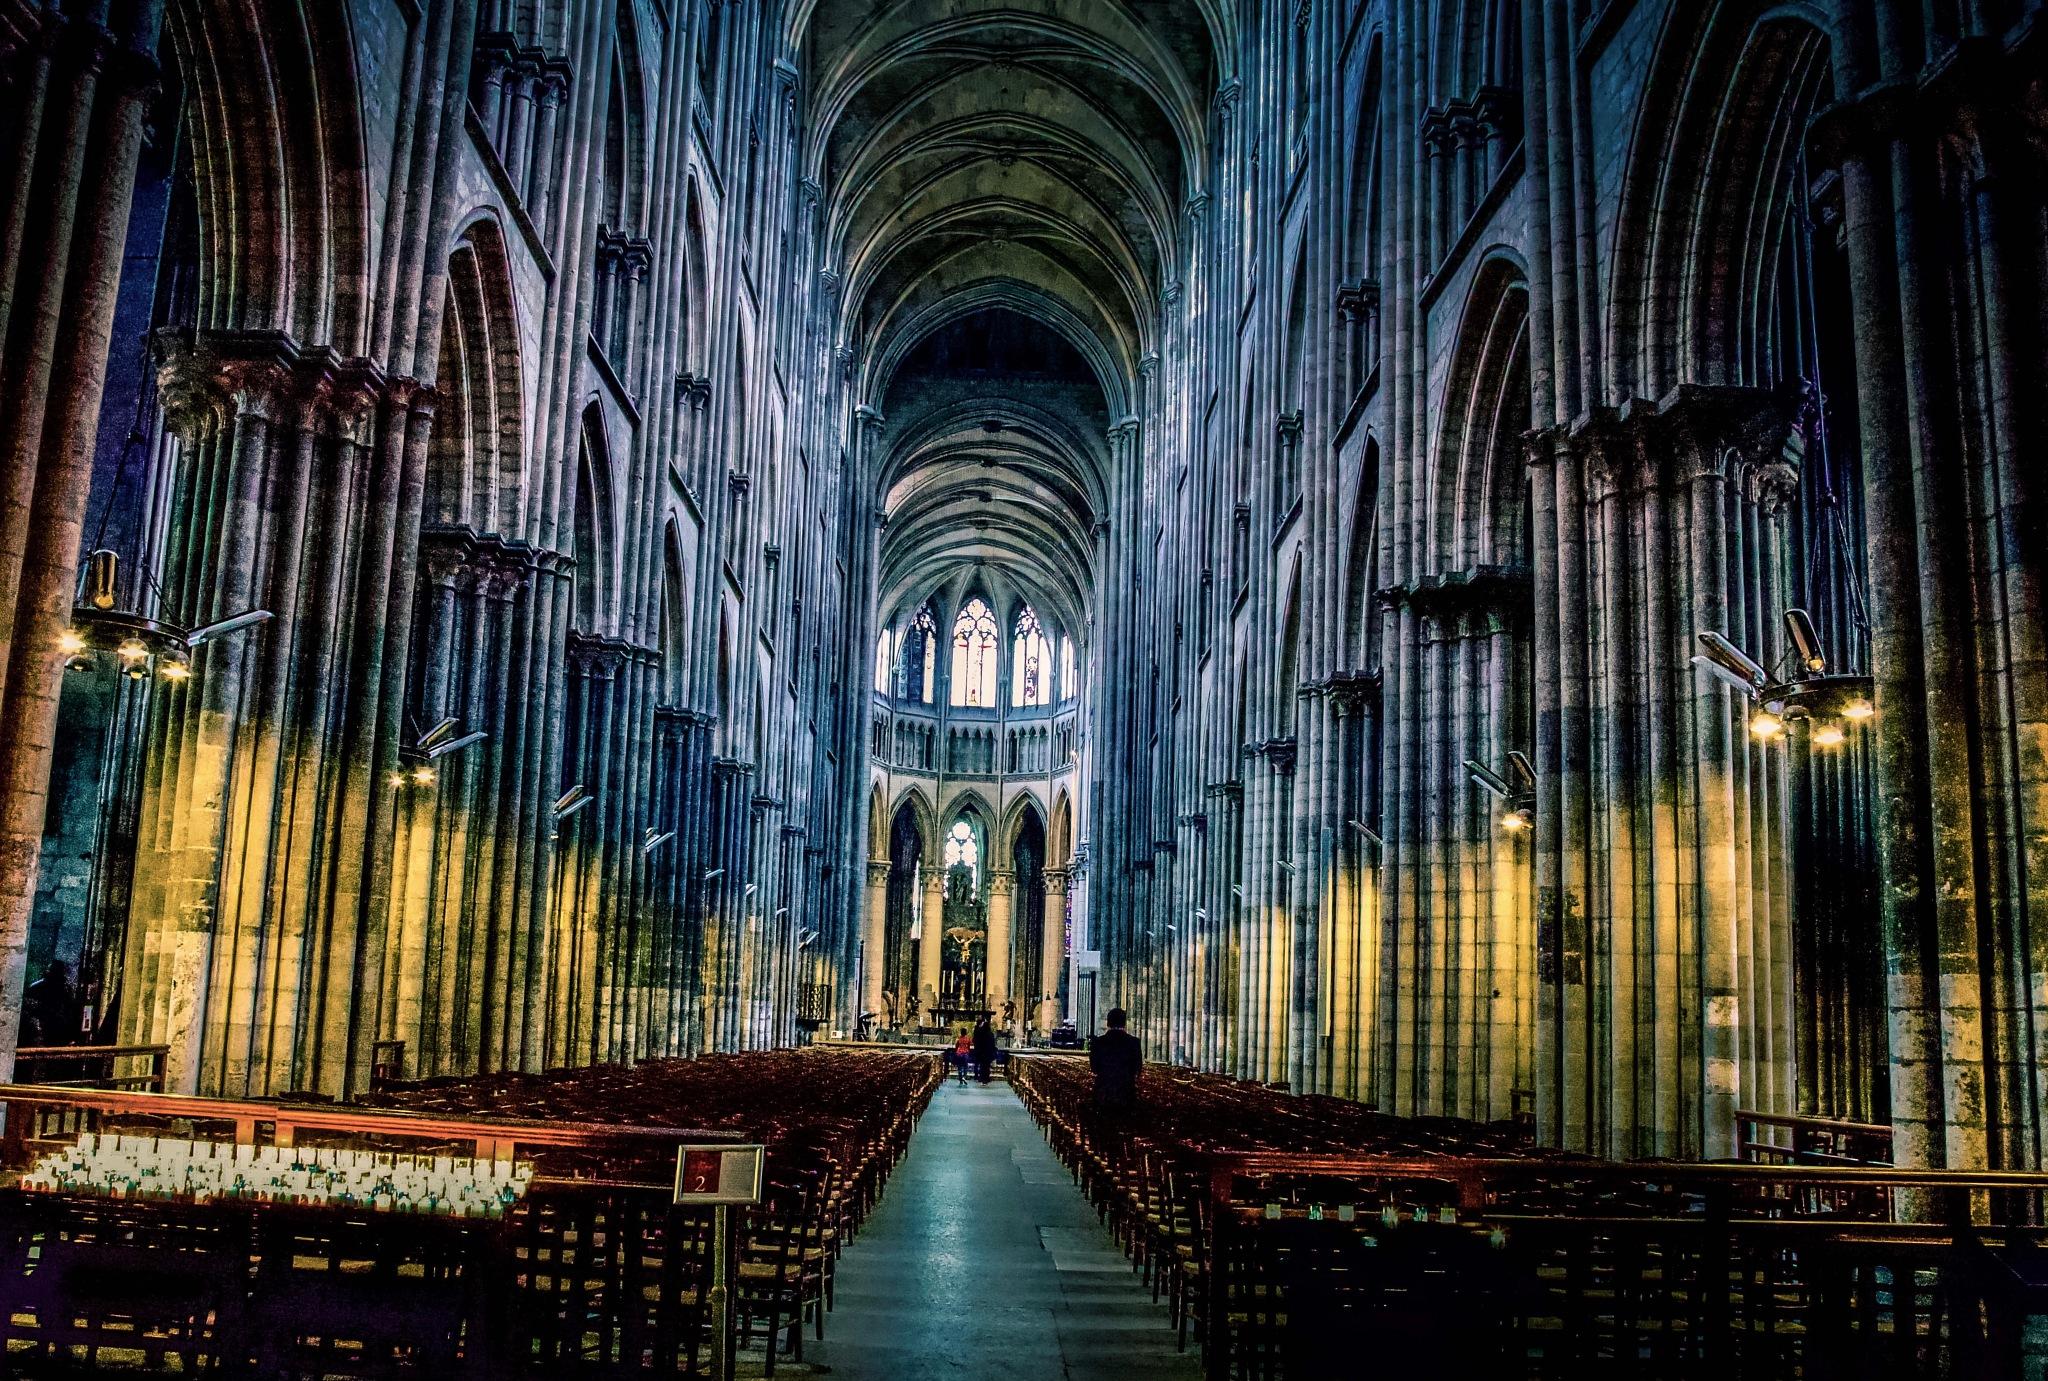 Nôtres-Dame-de-Rouen  by Eduardo Velasquez